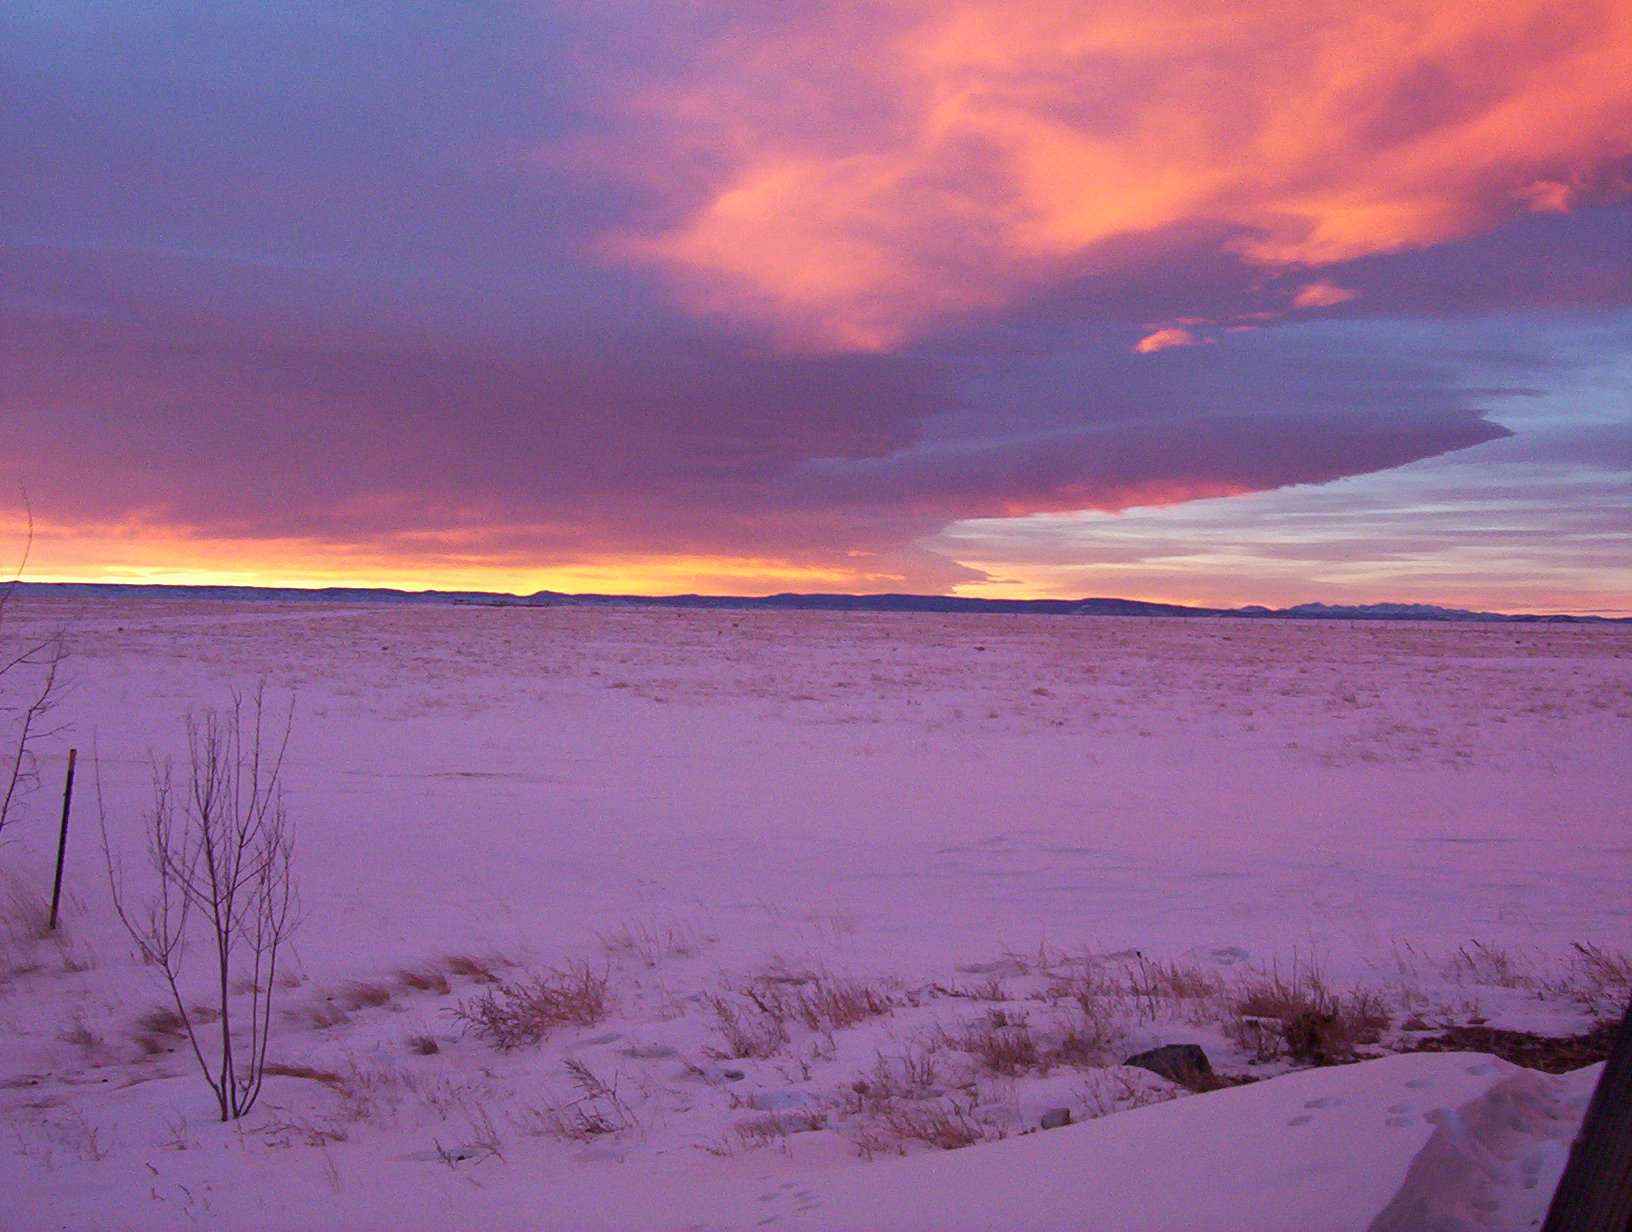 wyo_snow_at_sunset